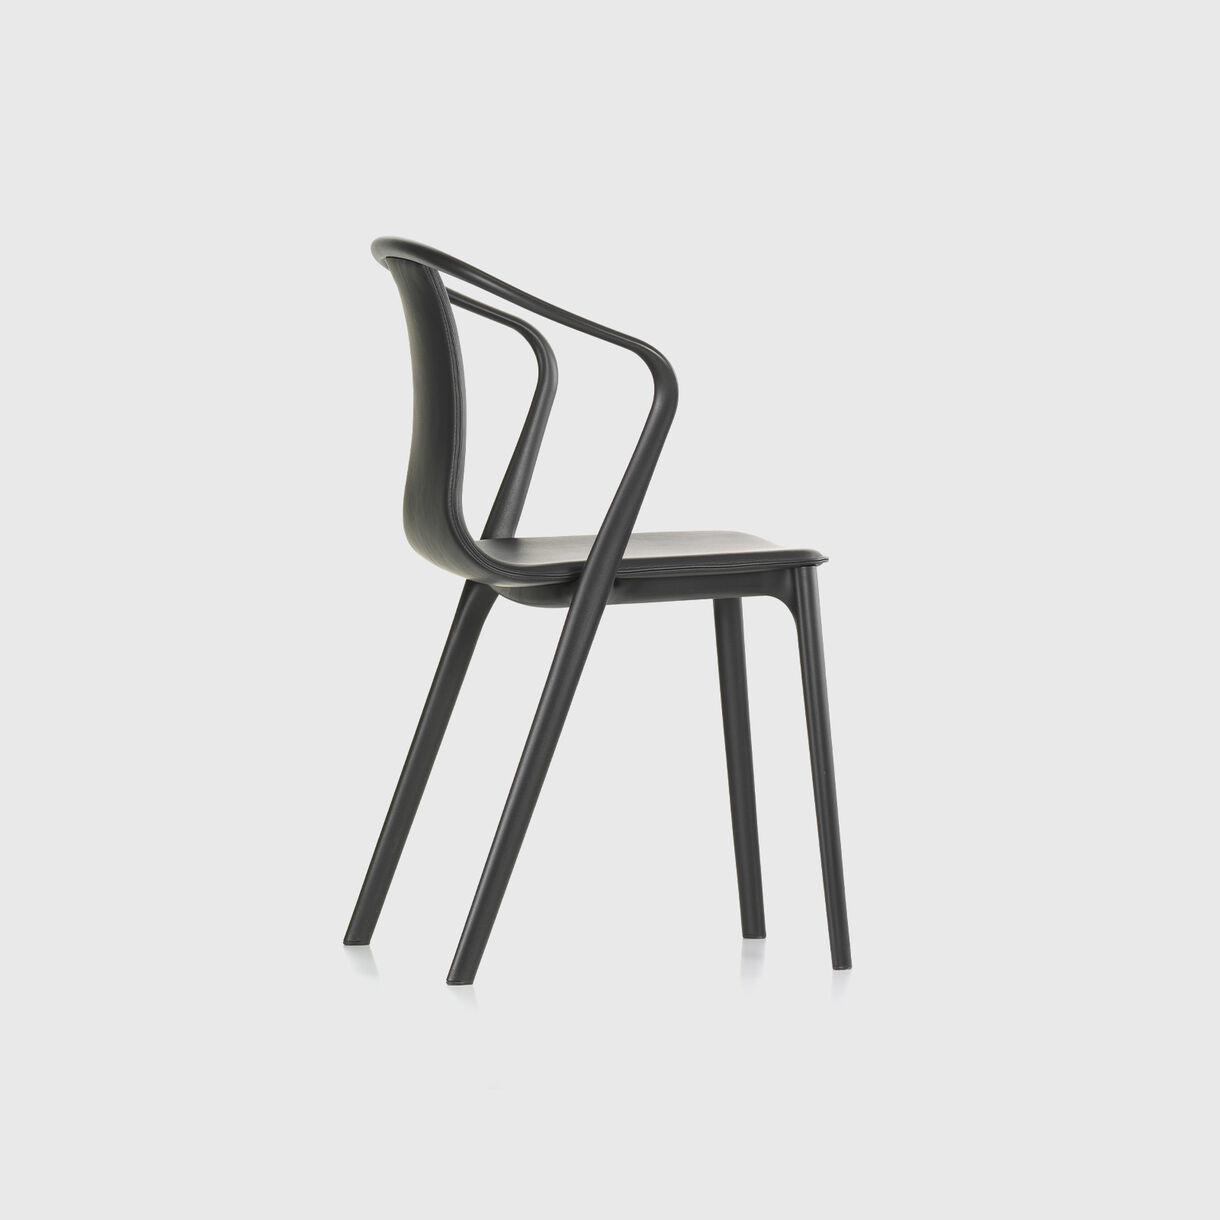 Belleville Armchair, Black Leather Upholstered